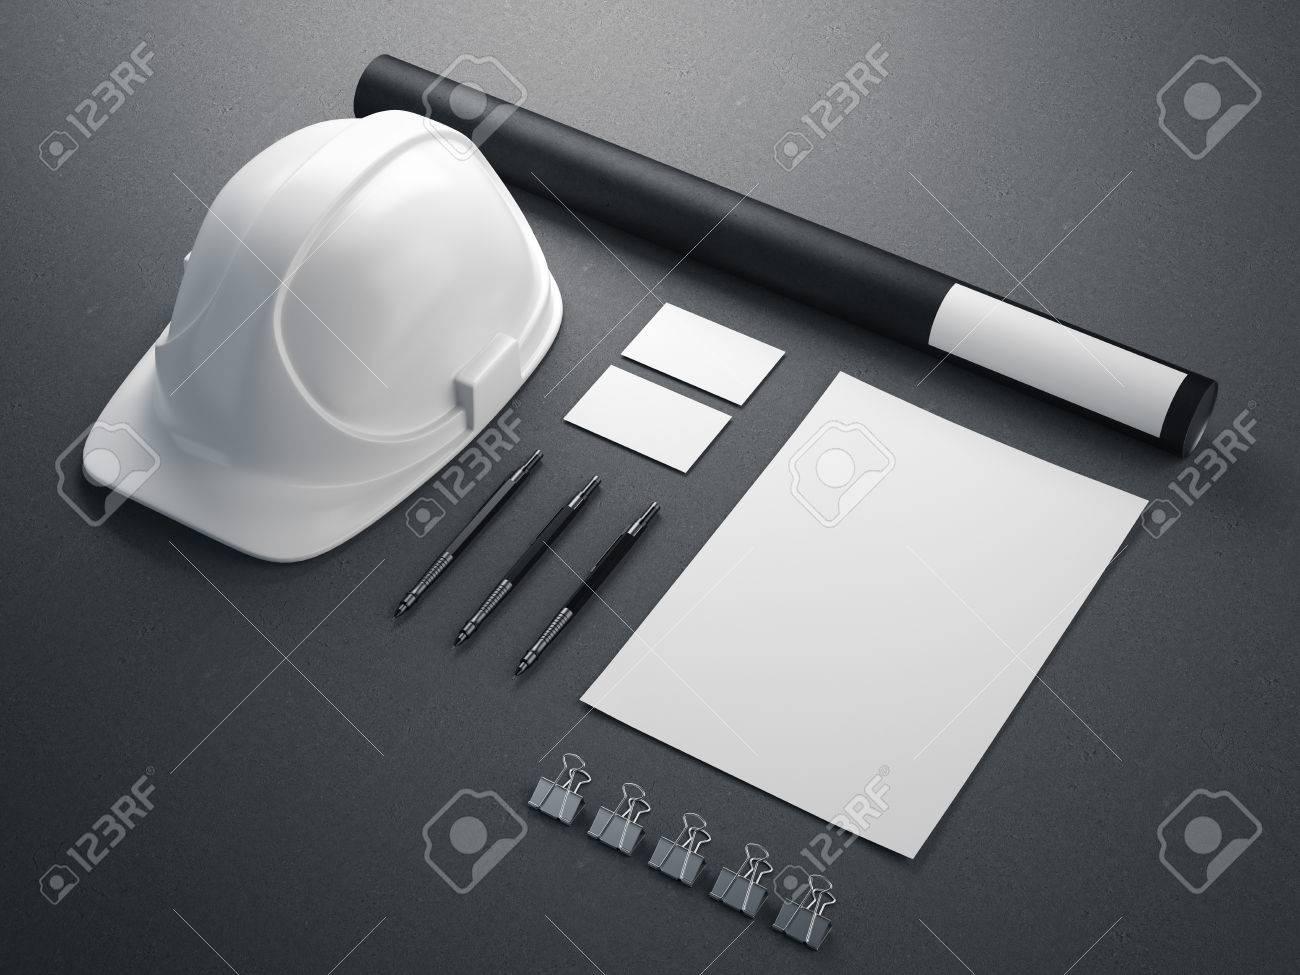 99f7f58c23f Modern branding mockup with white helmet. 3d rendering Stock Photo -  62488590